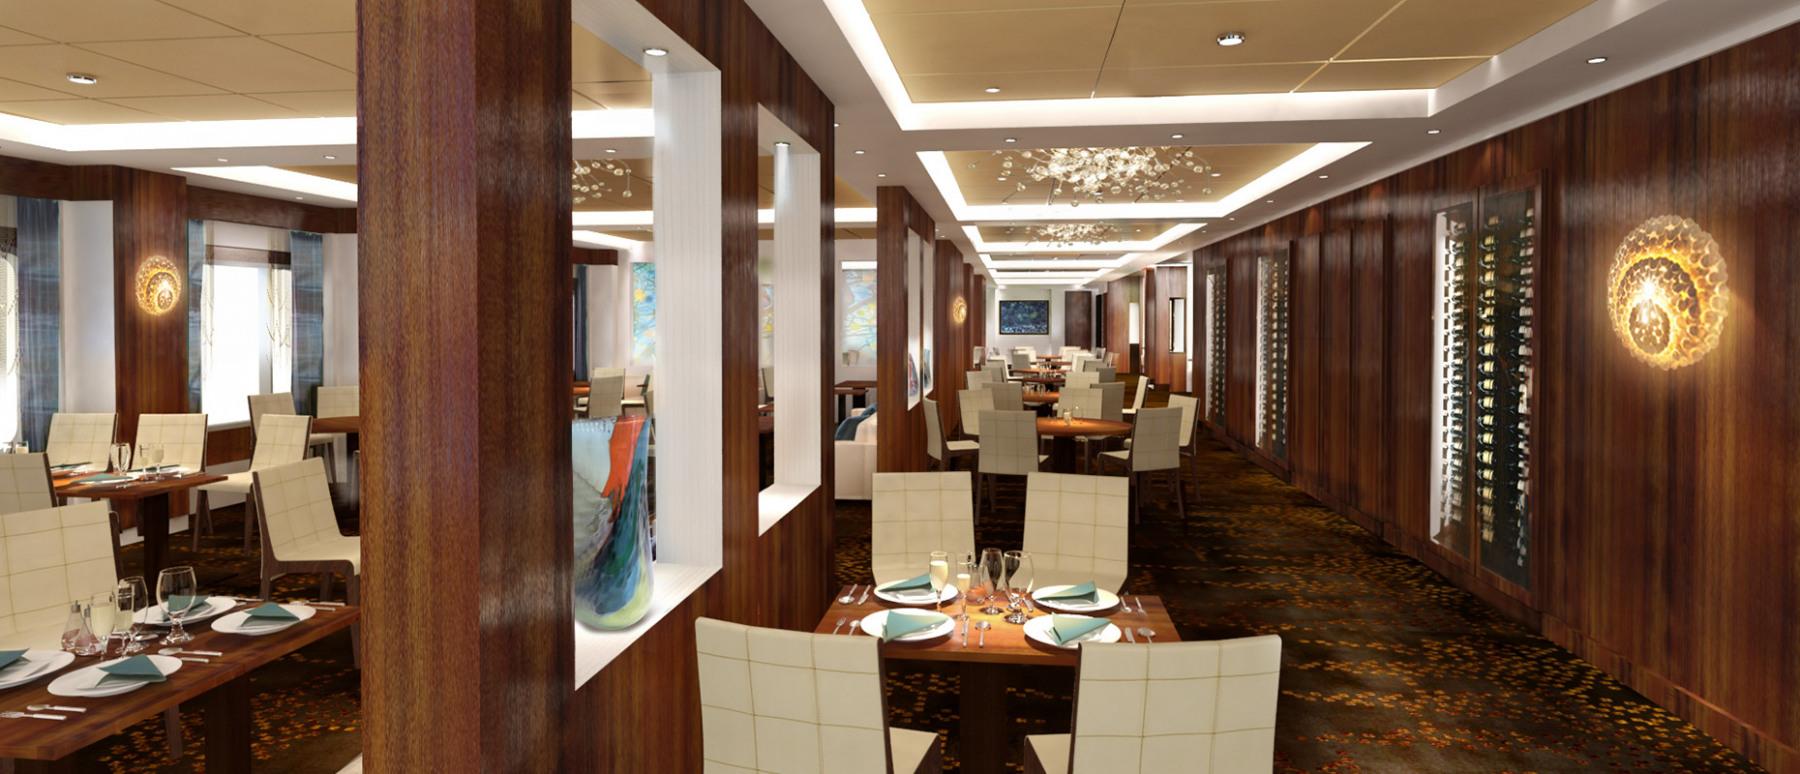 Norwegian Cruise Line Norwegian Escape Interior Taste.jpg